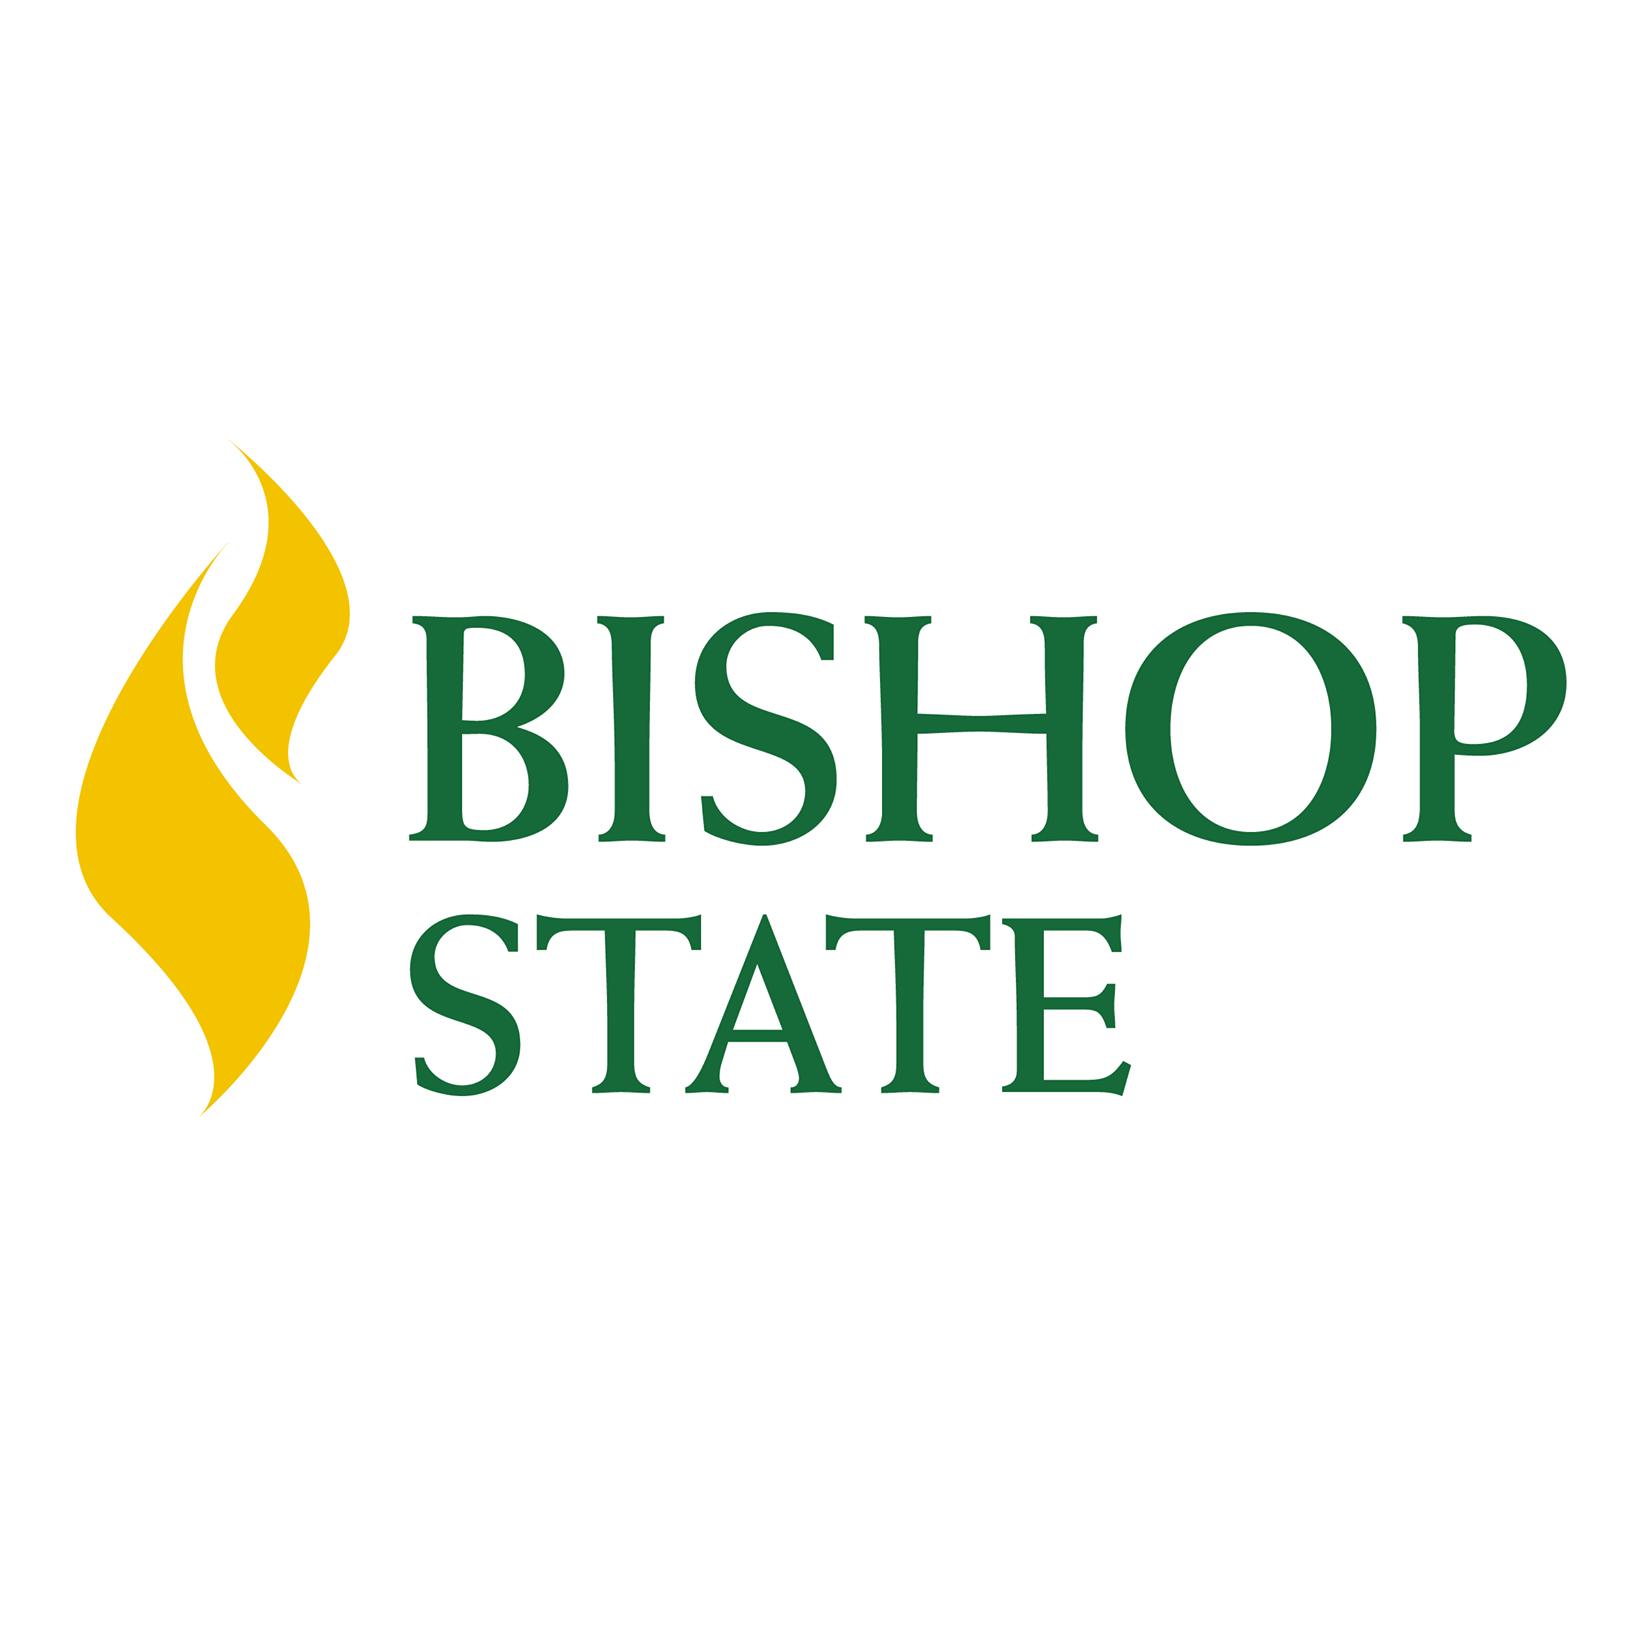 Bishop State | Dr. Reggie Sykes